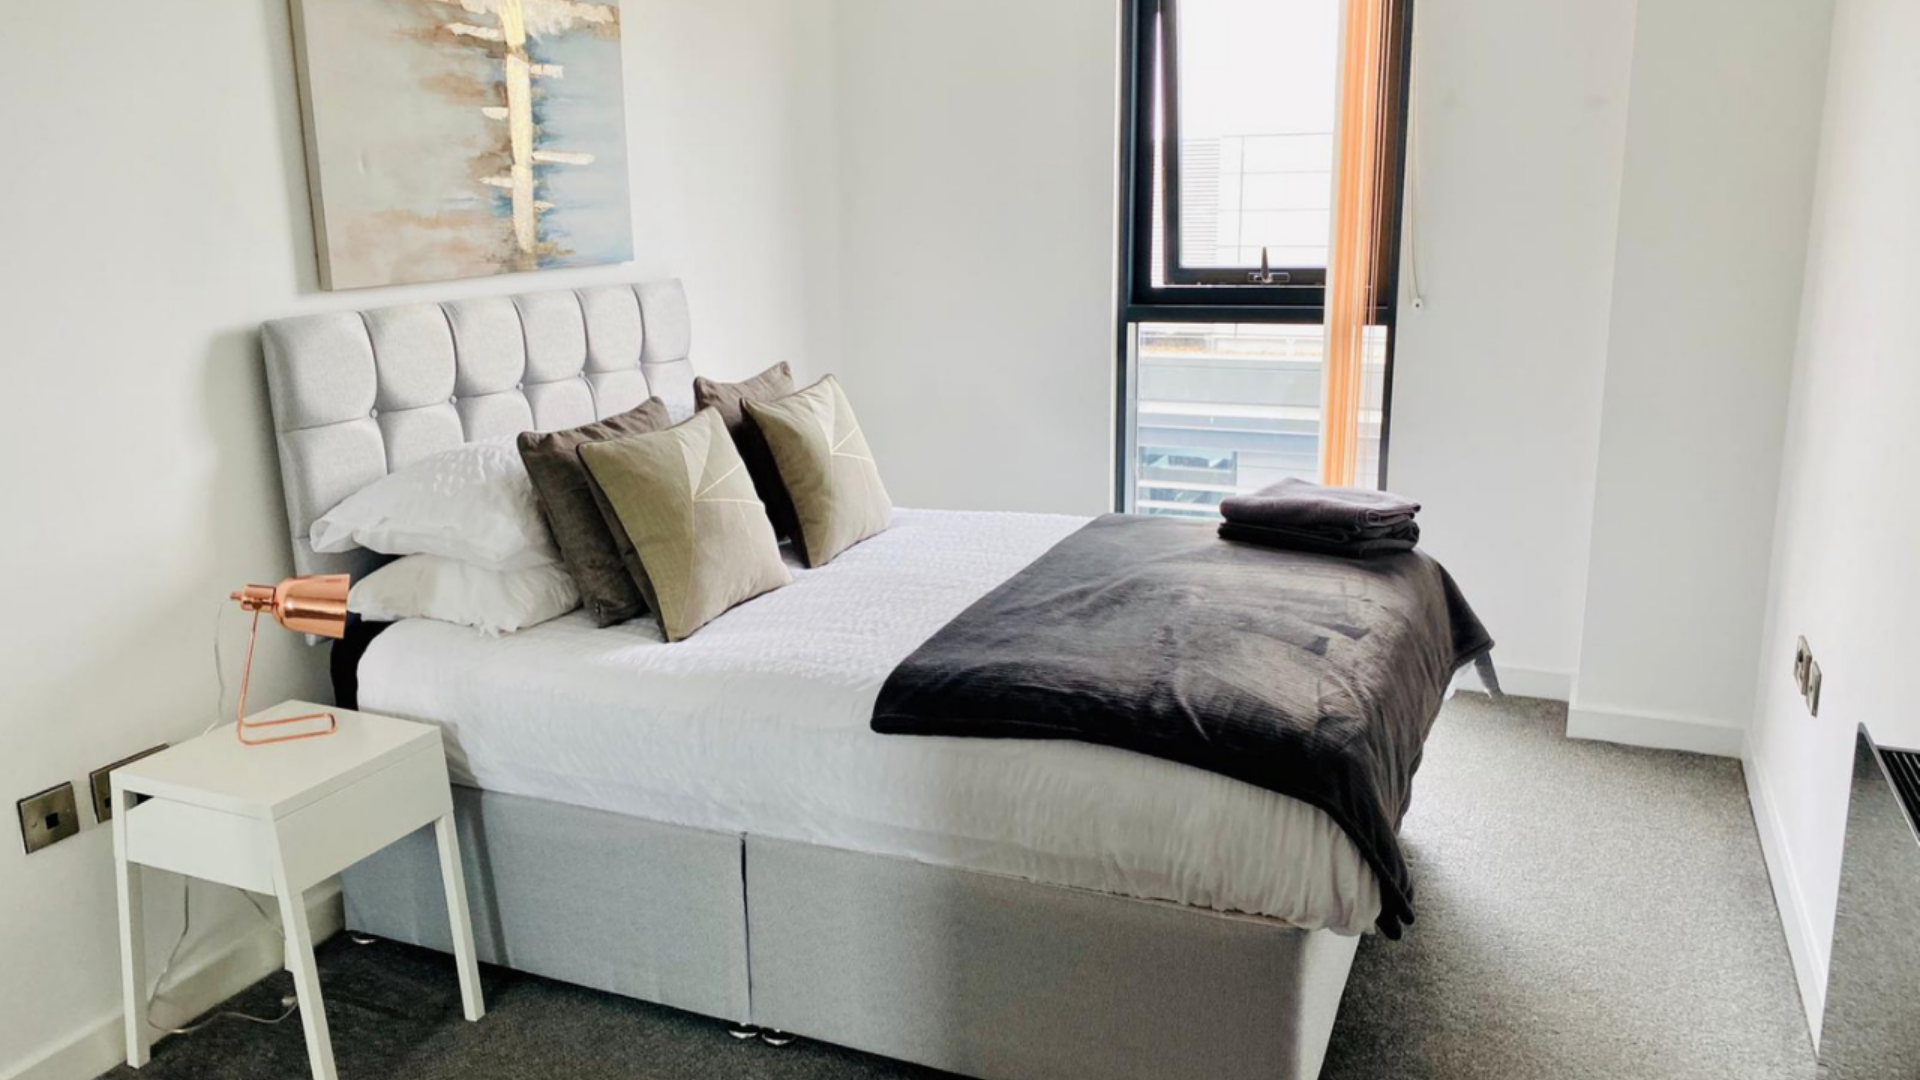 White bedding at Quarter Blonk Street Apartments, Centre, Sheffield - Citybase Apartments